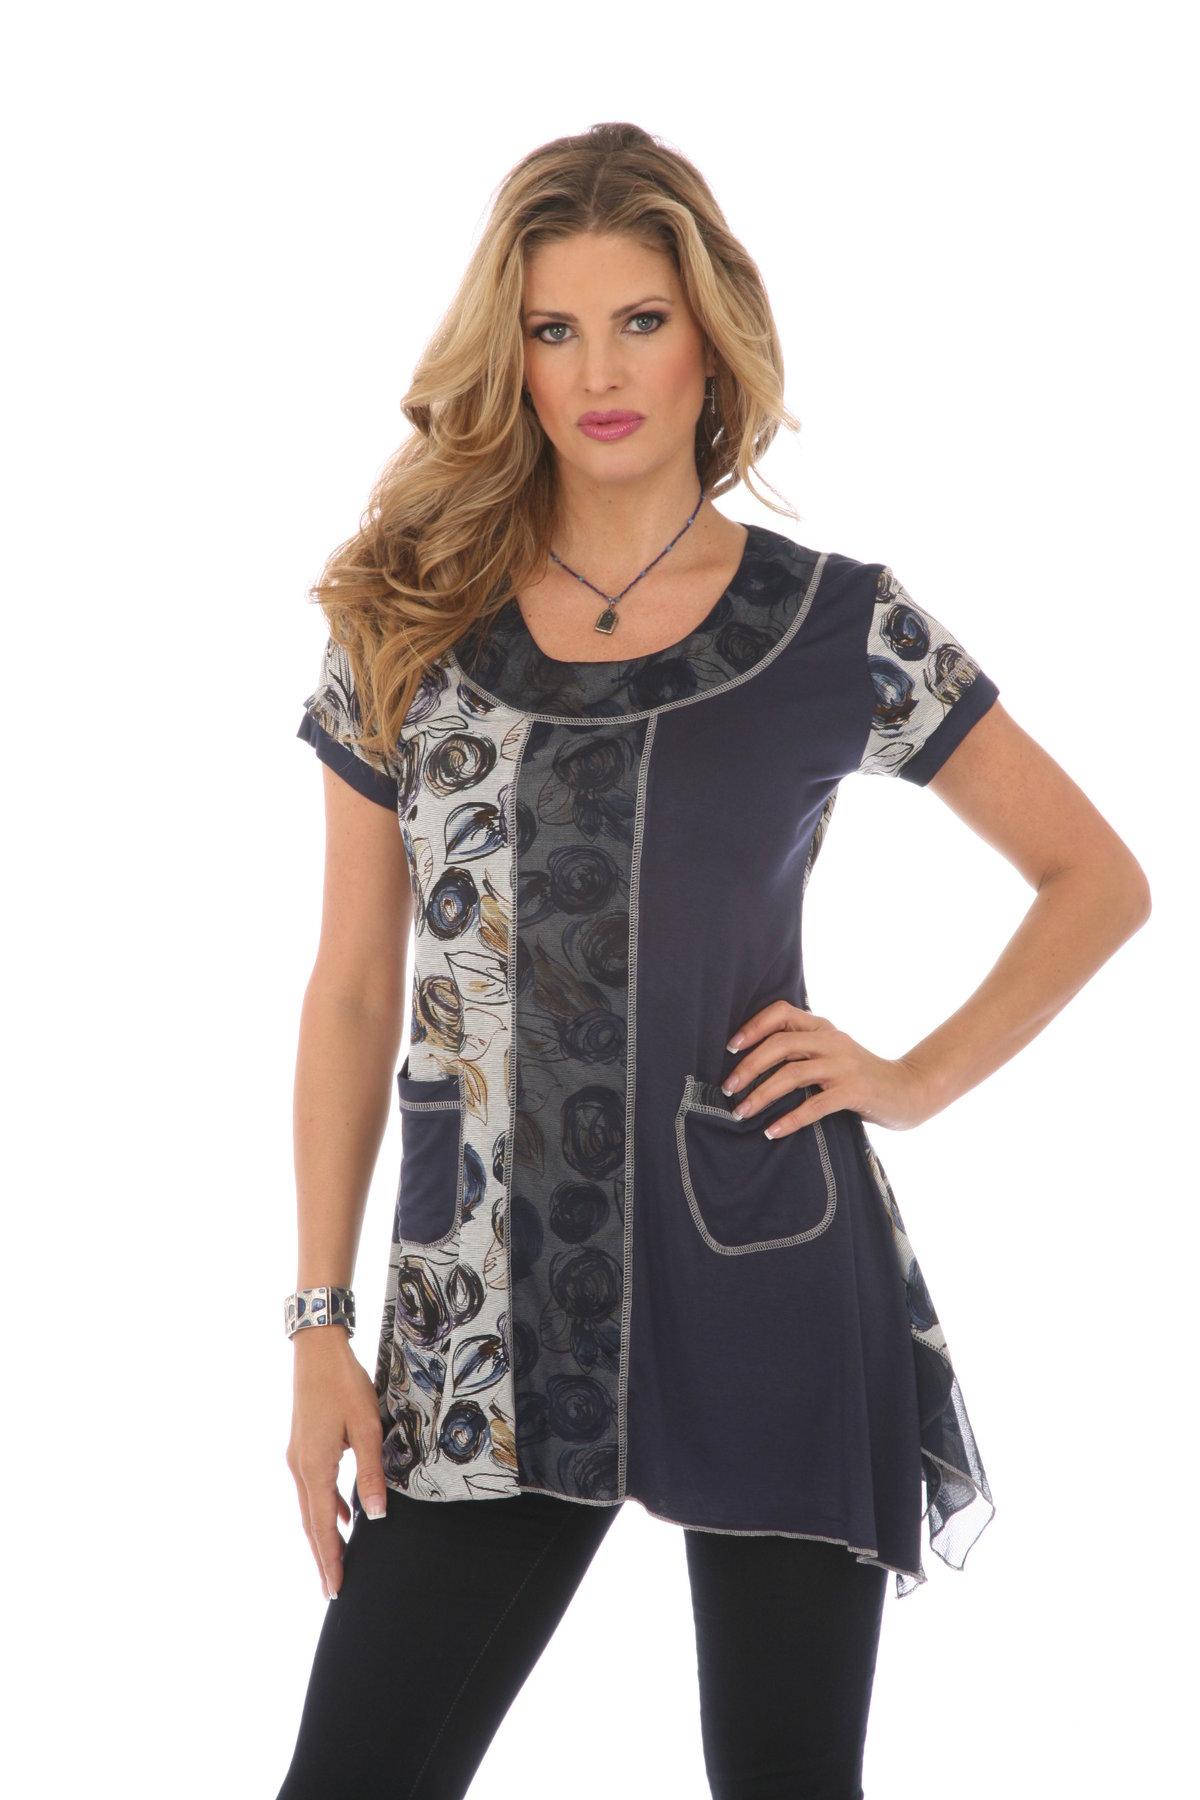 Hot fashion clothes women 21